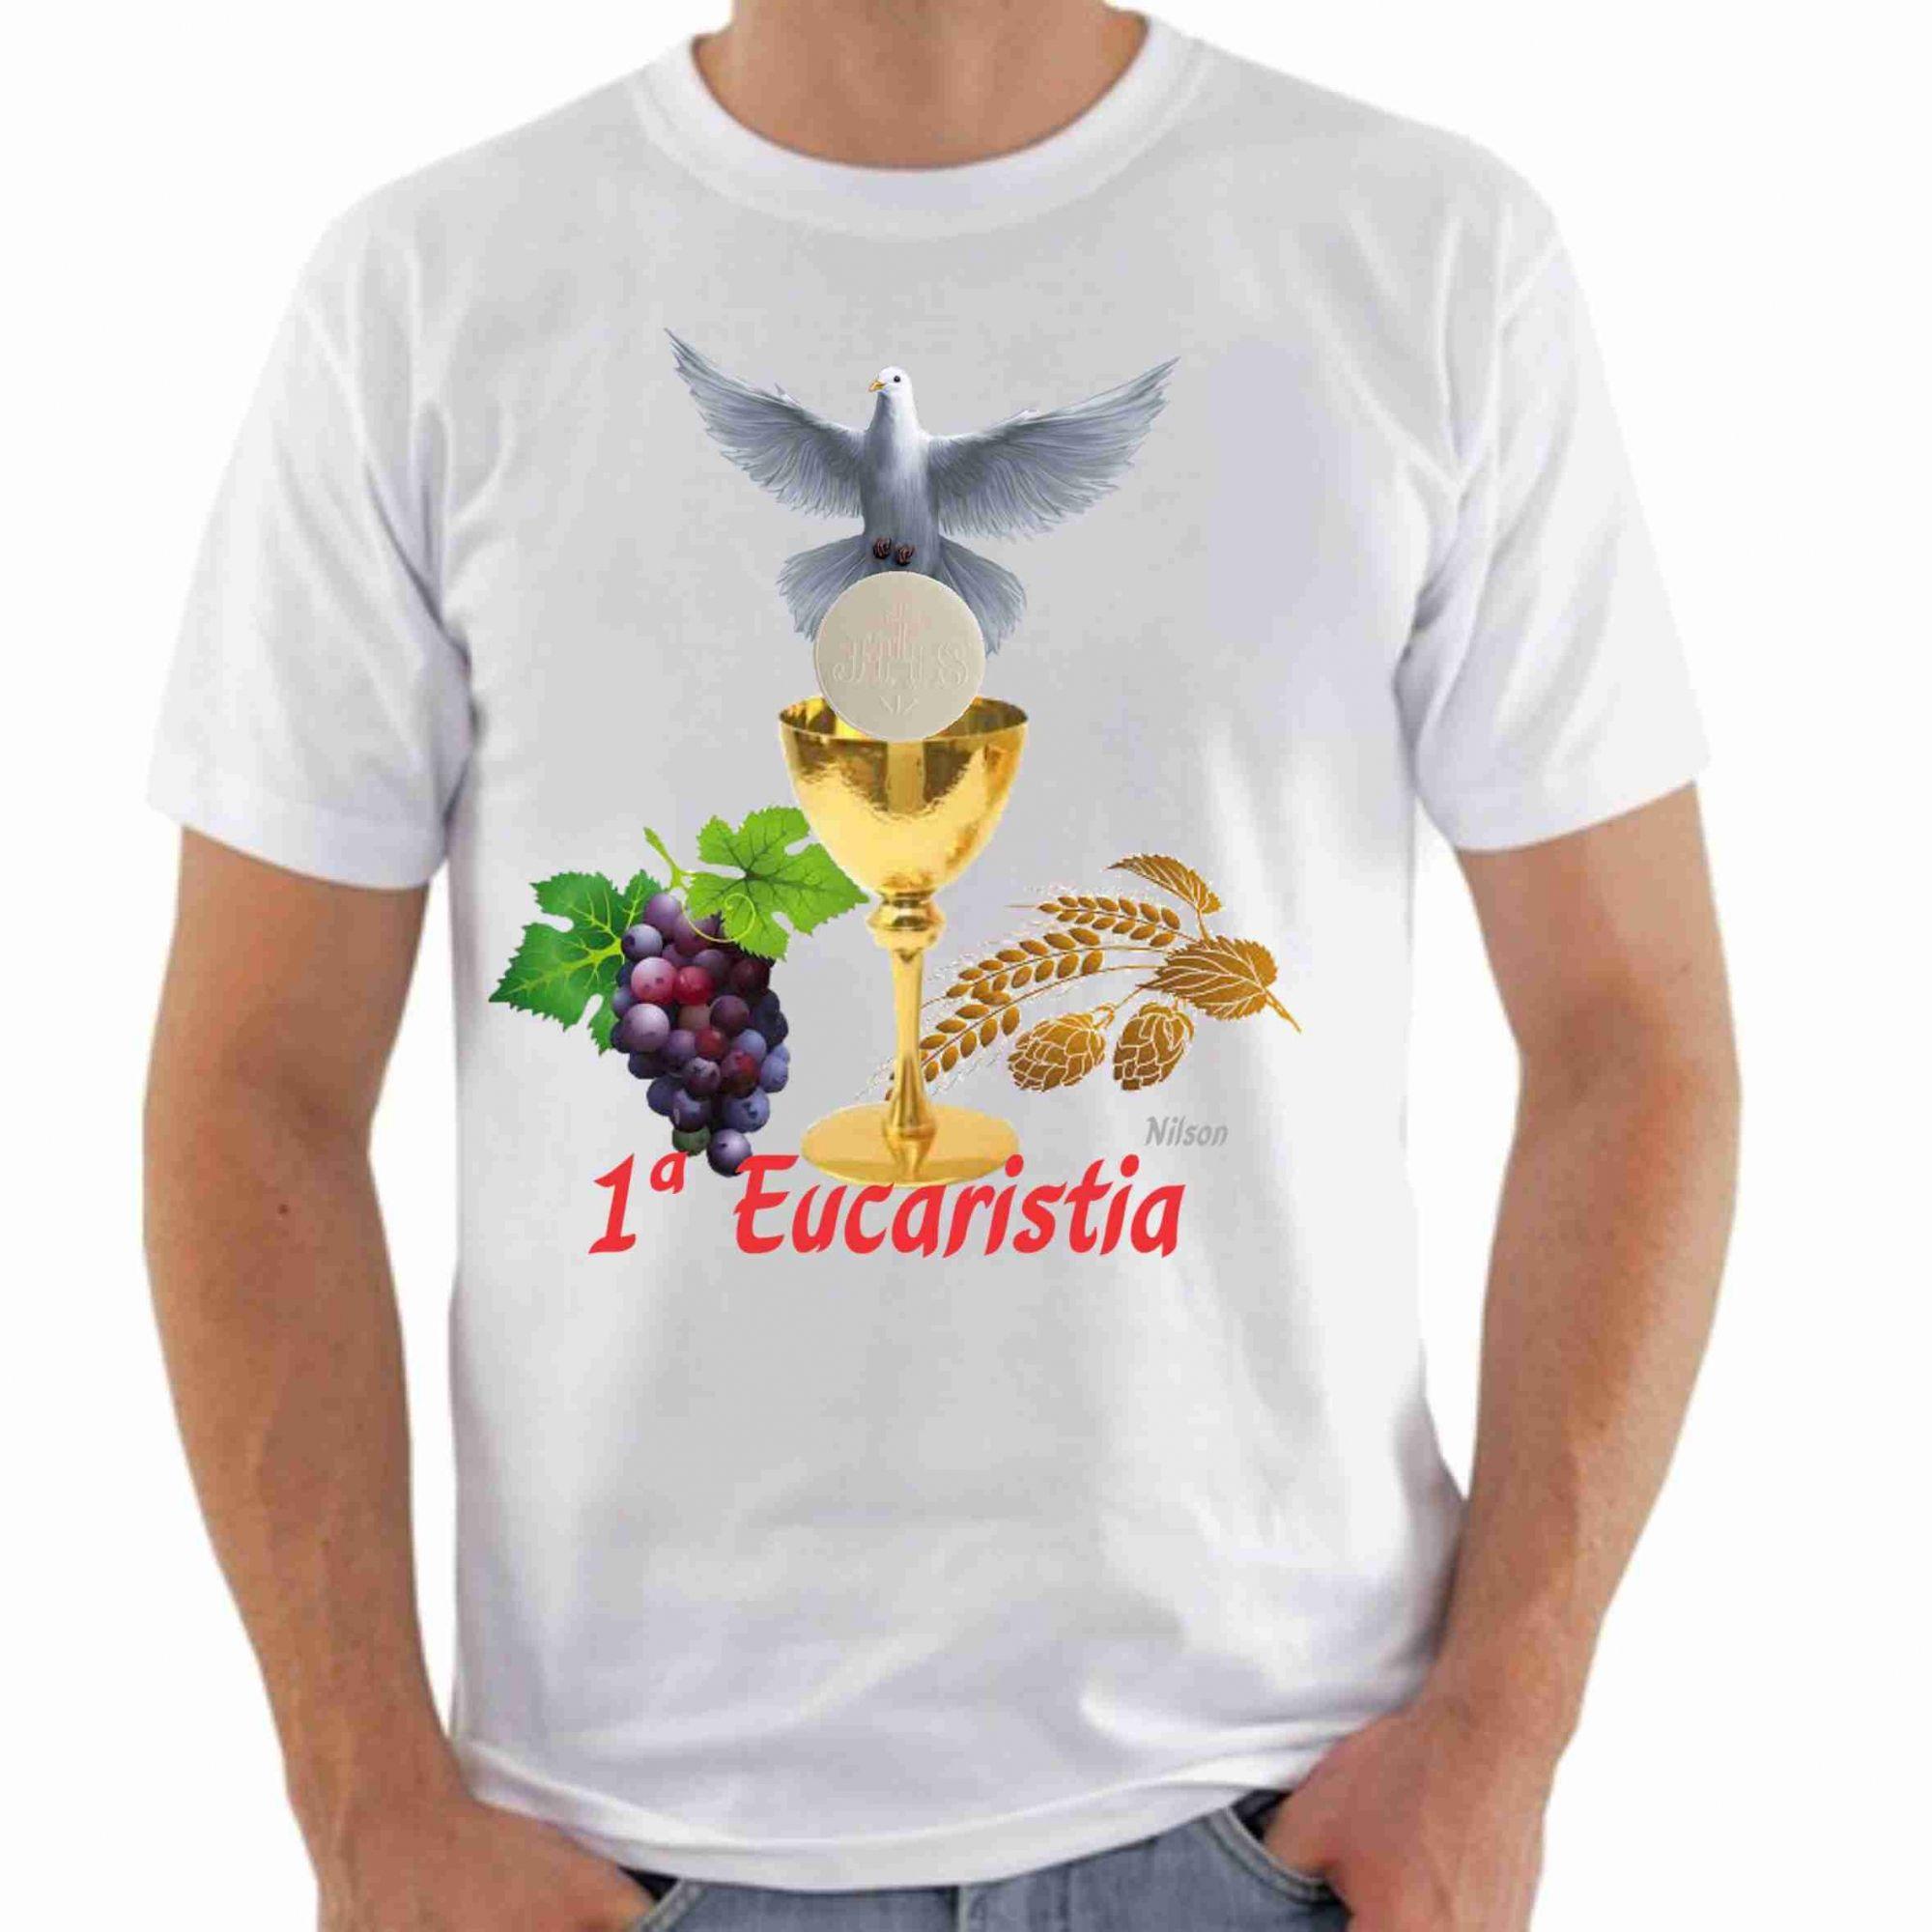 Camiseta religiosa eucaristia